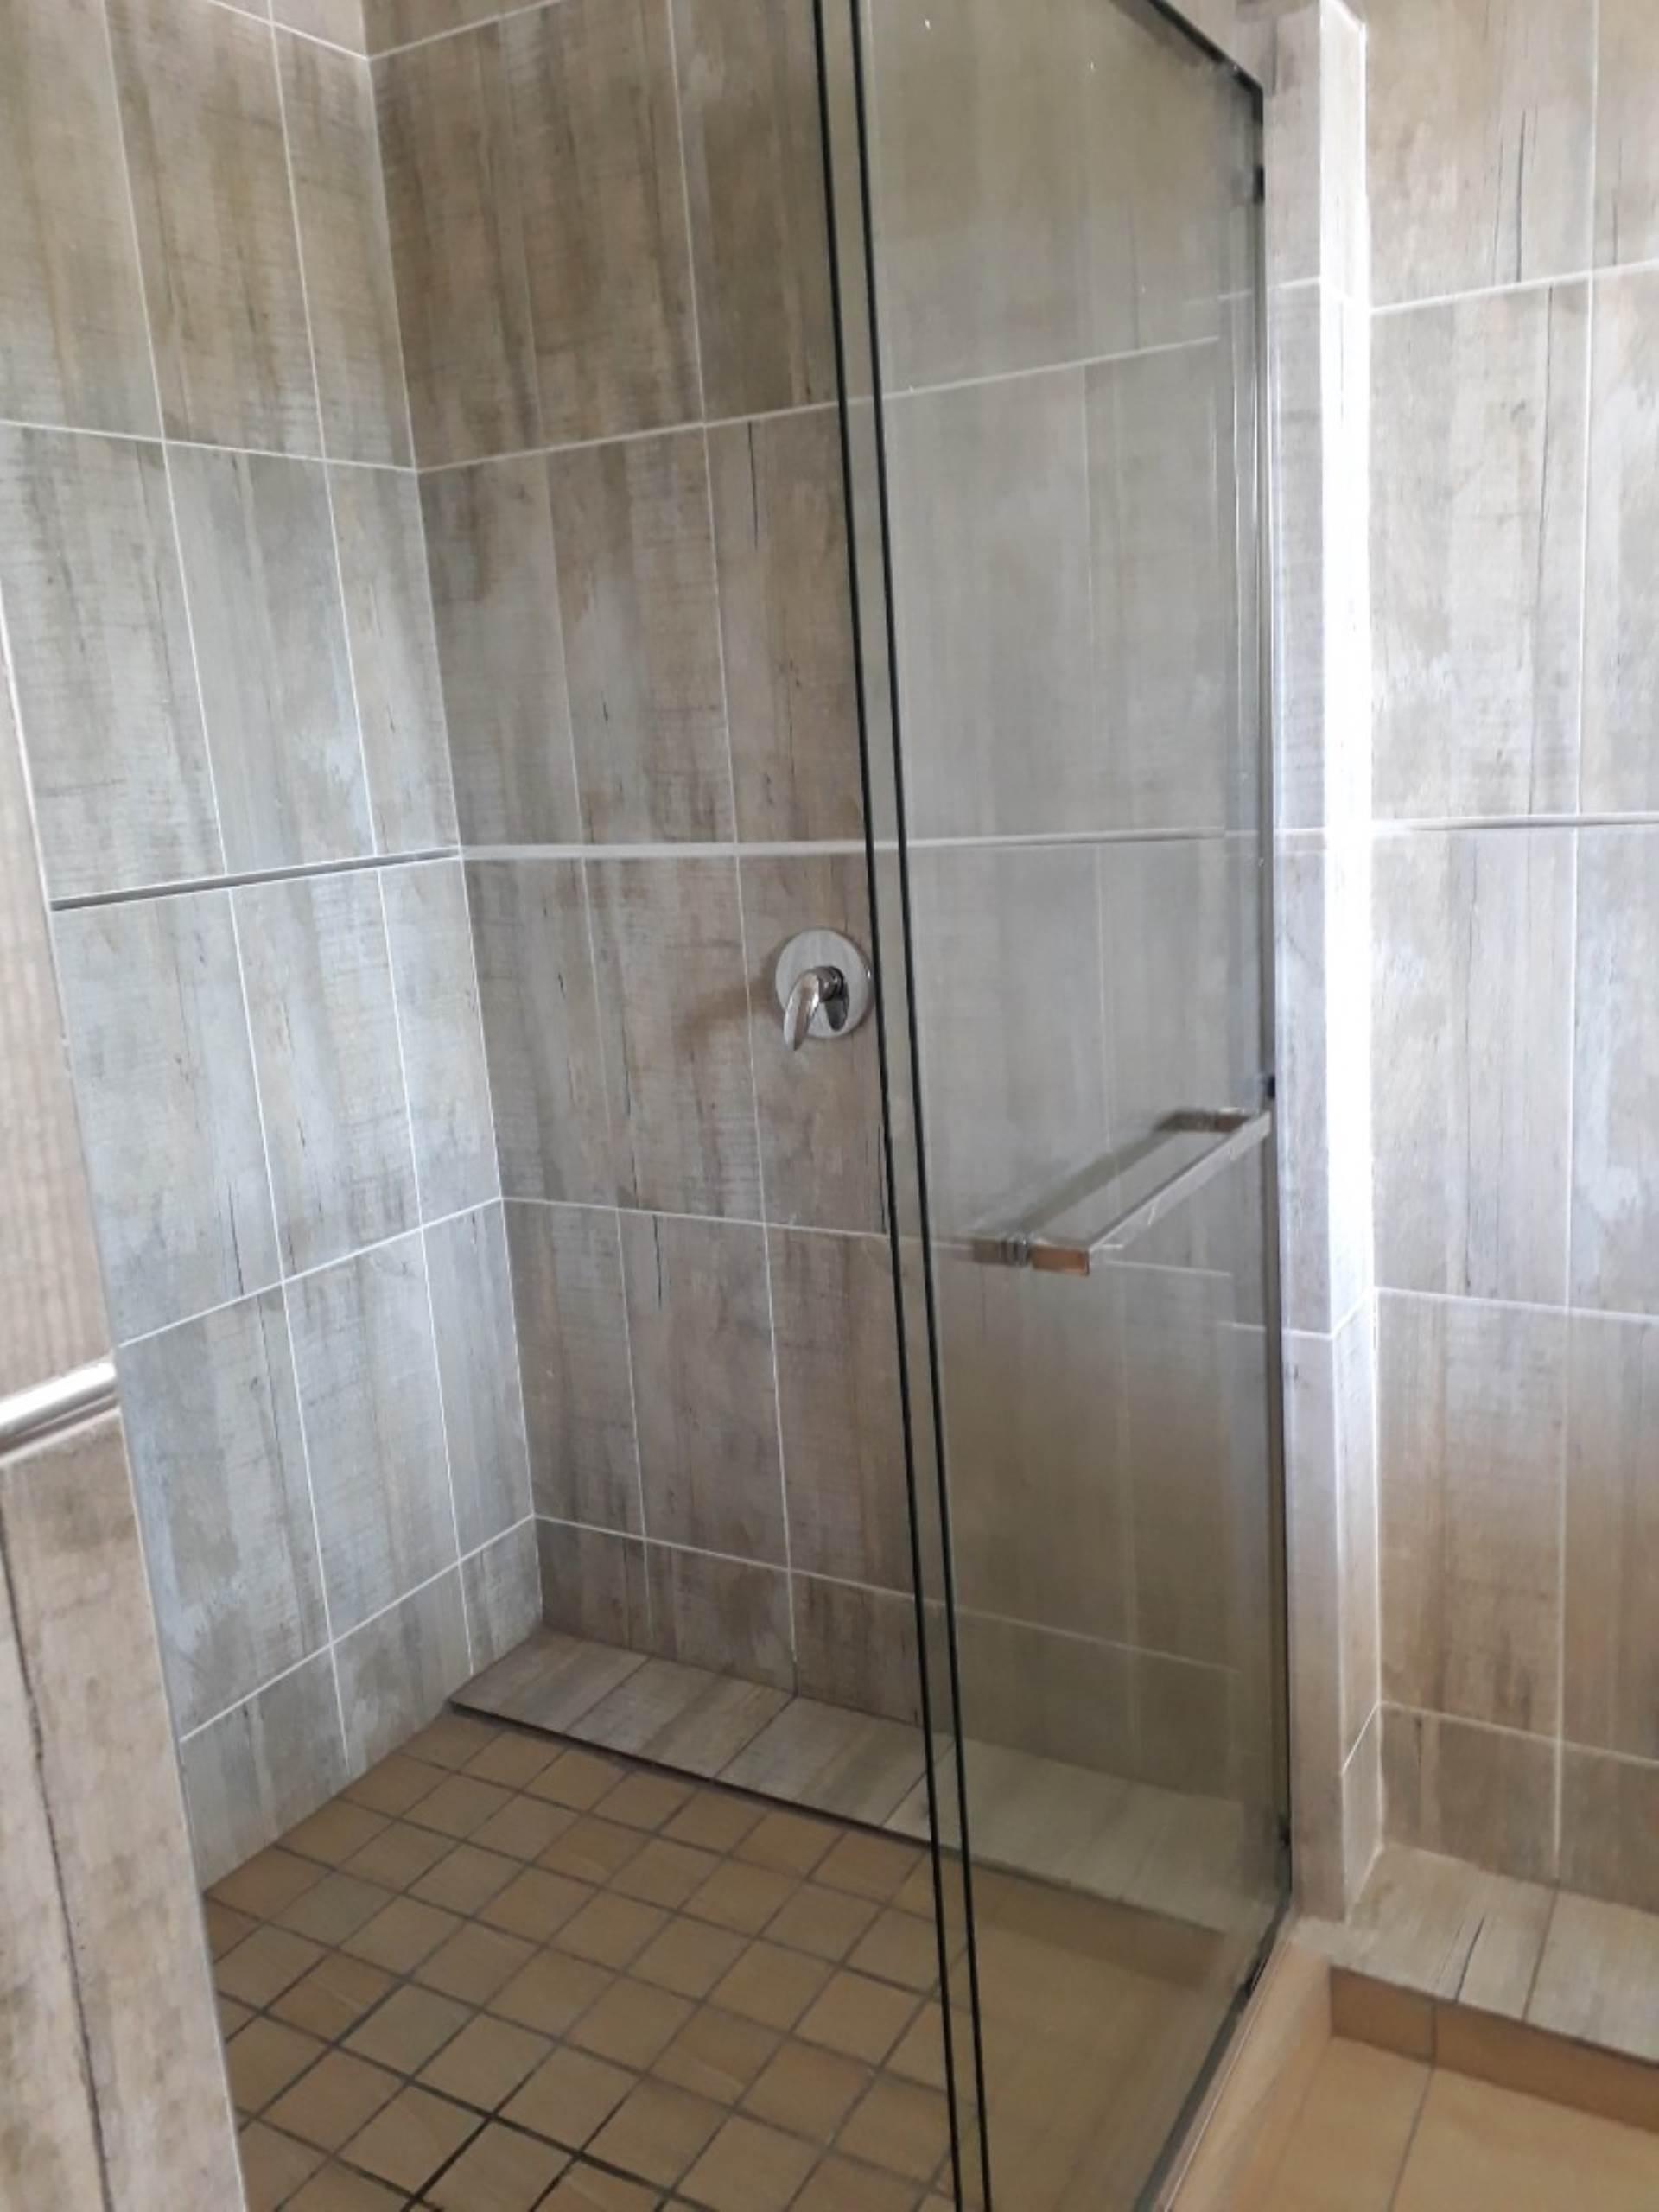 2 BedroomTownhouse To Rent In Vaalpark